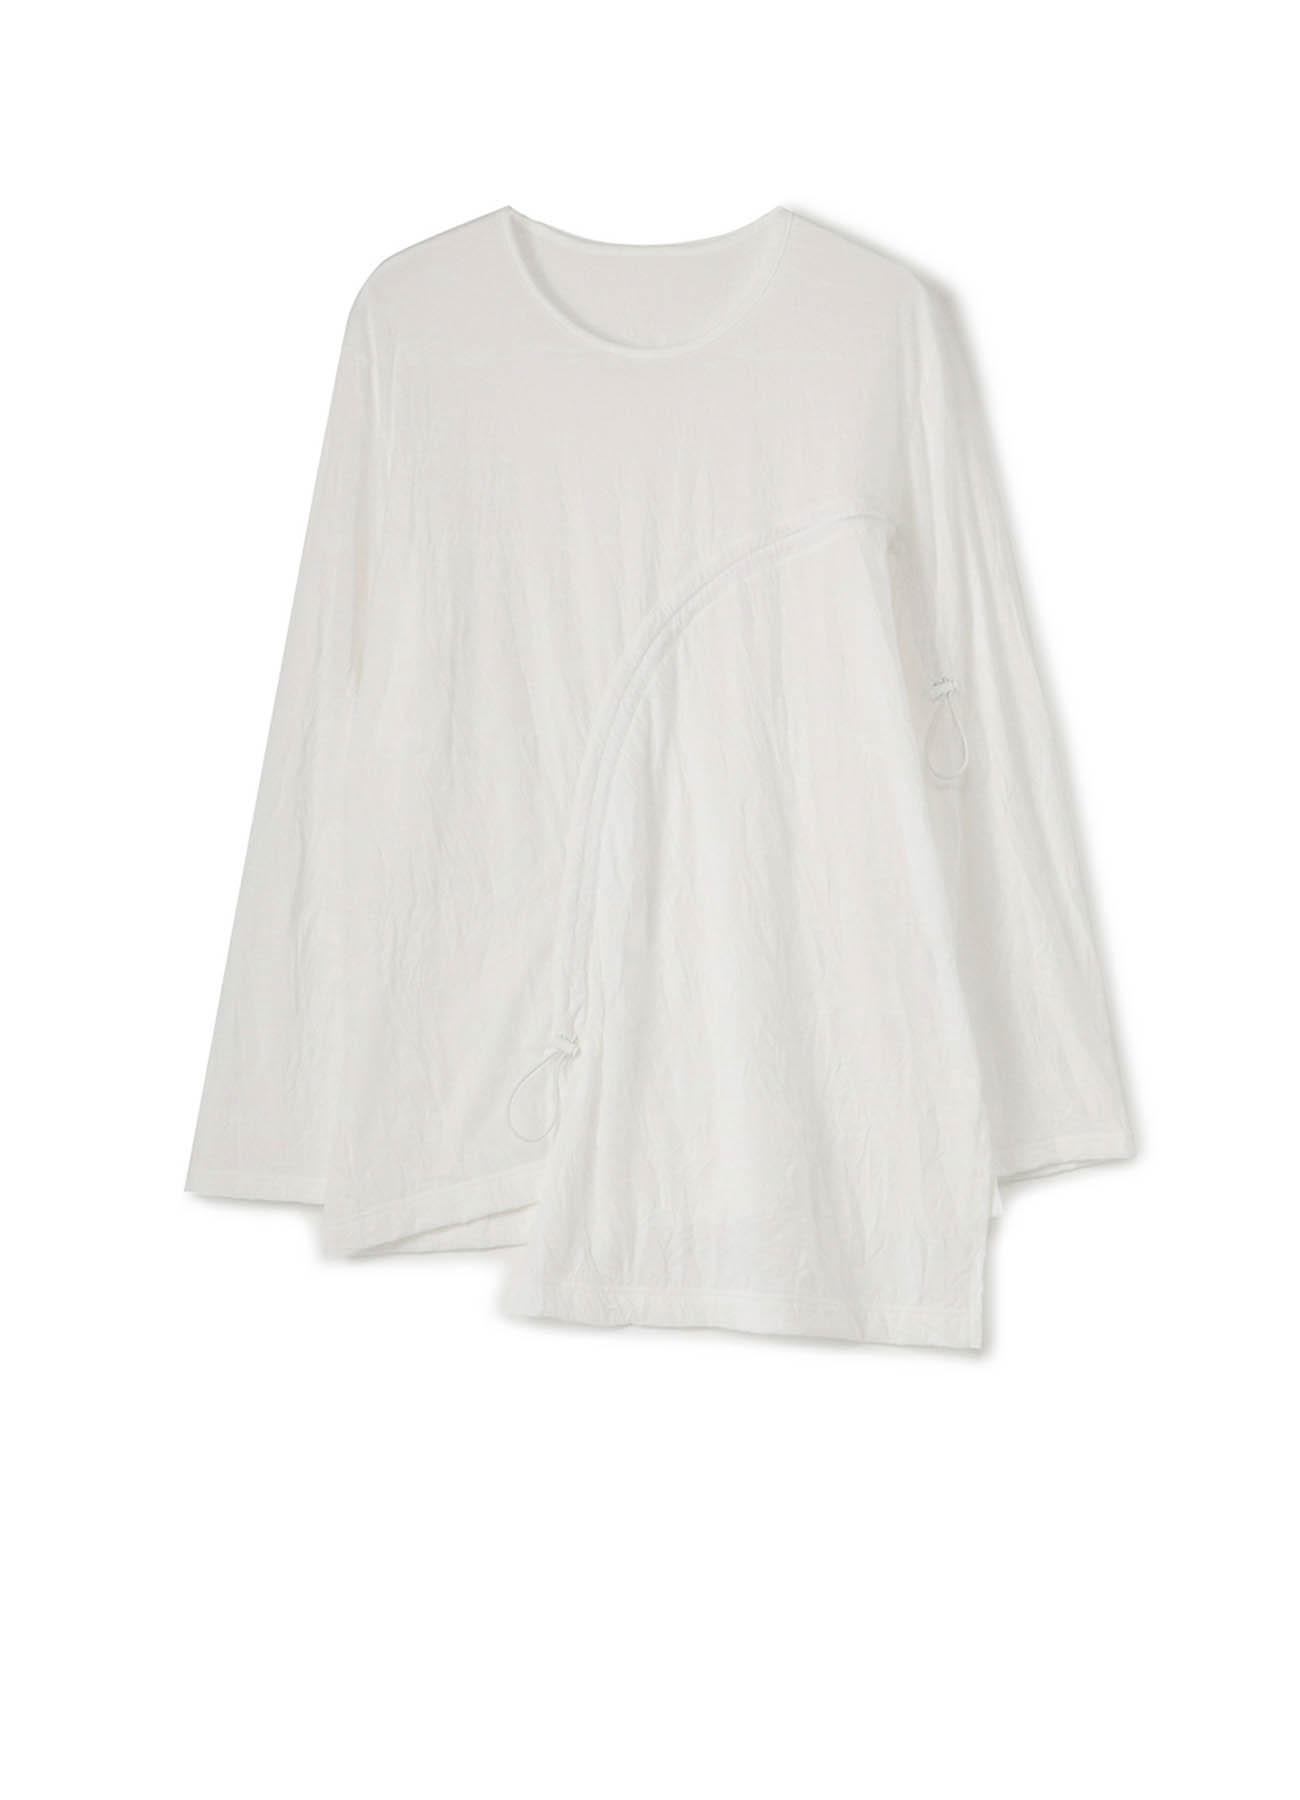 C/Pe Washer Jersey Drawstring Cut Sew